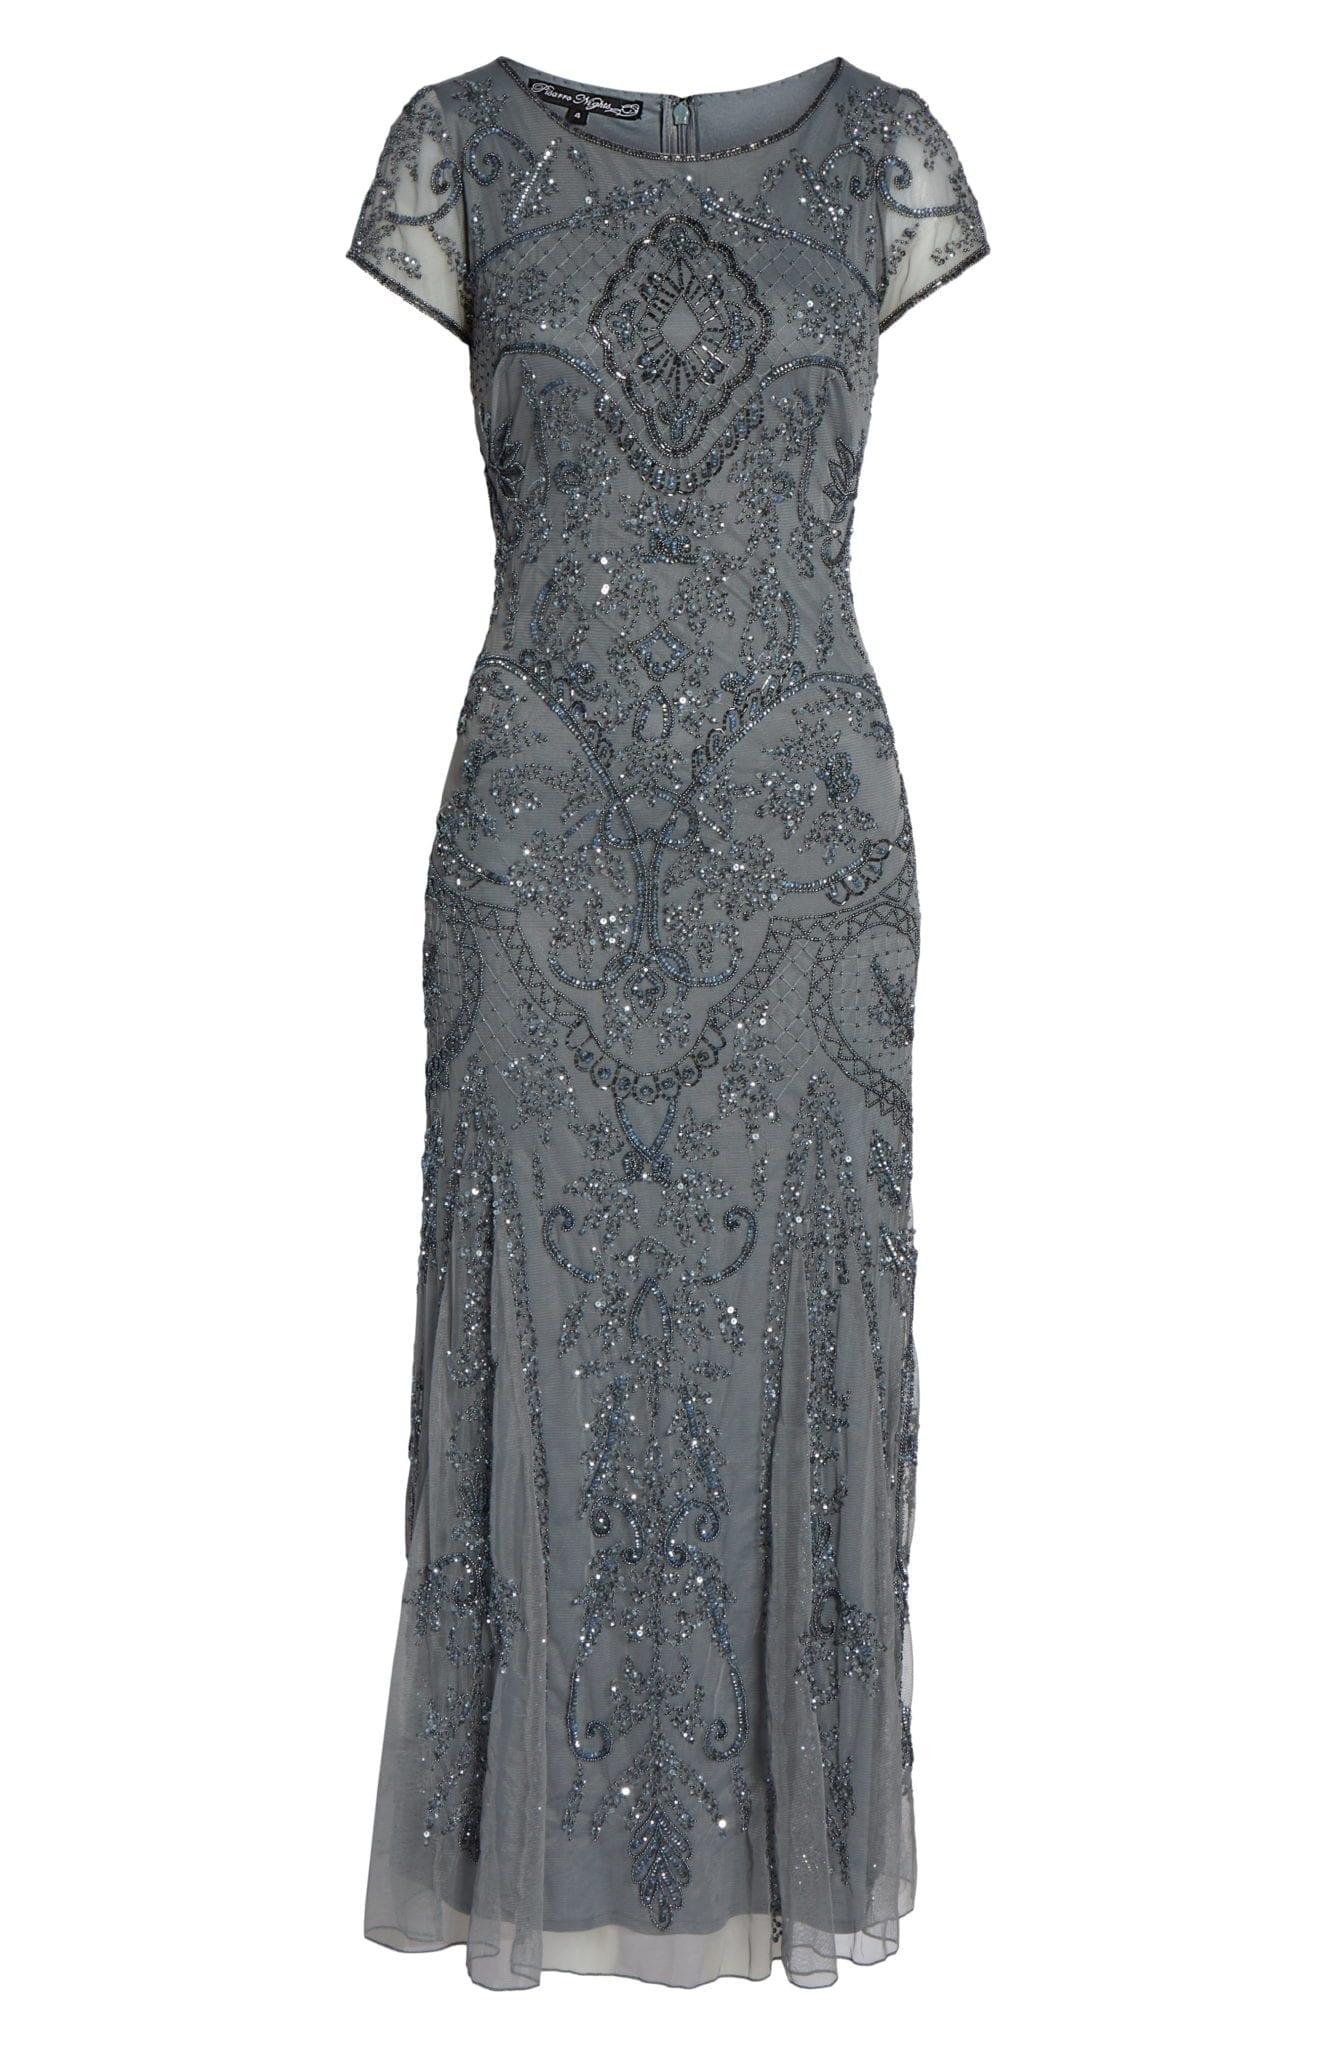 PISARRO NIGHTS Embellished Mesh Grey Gown